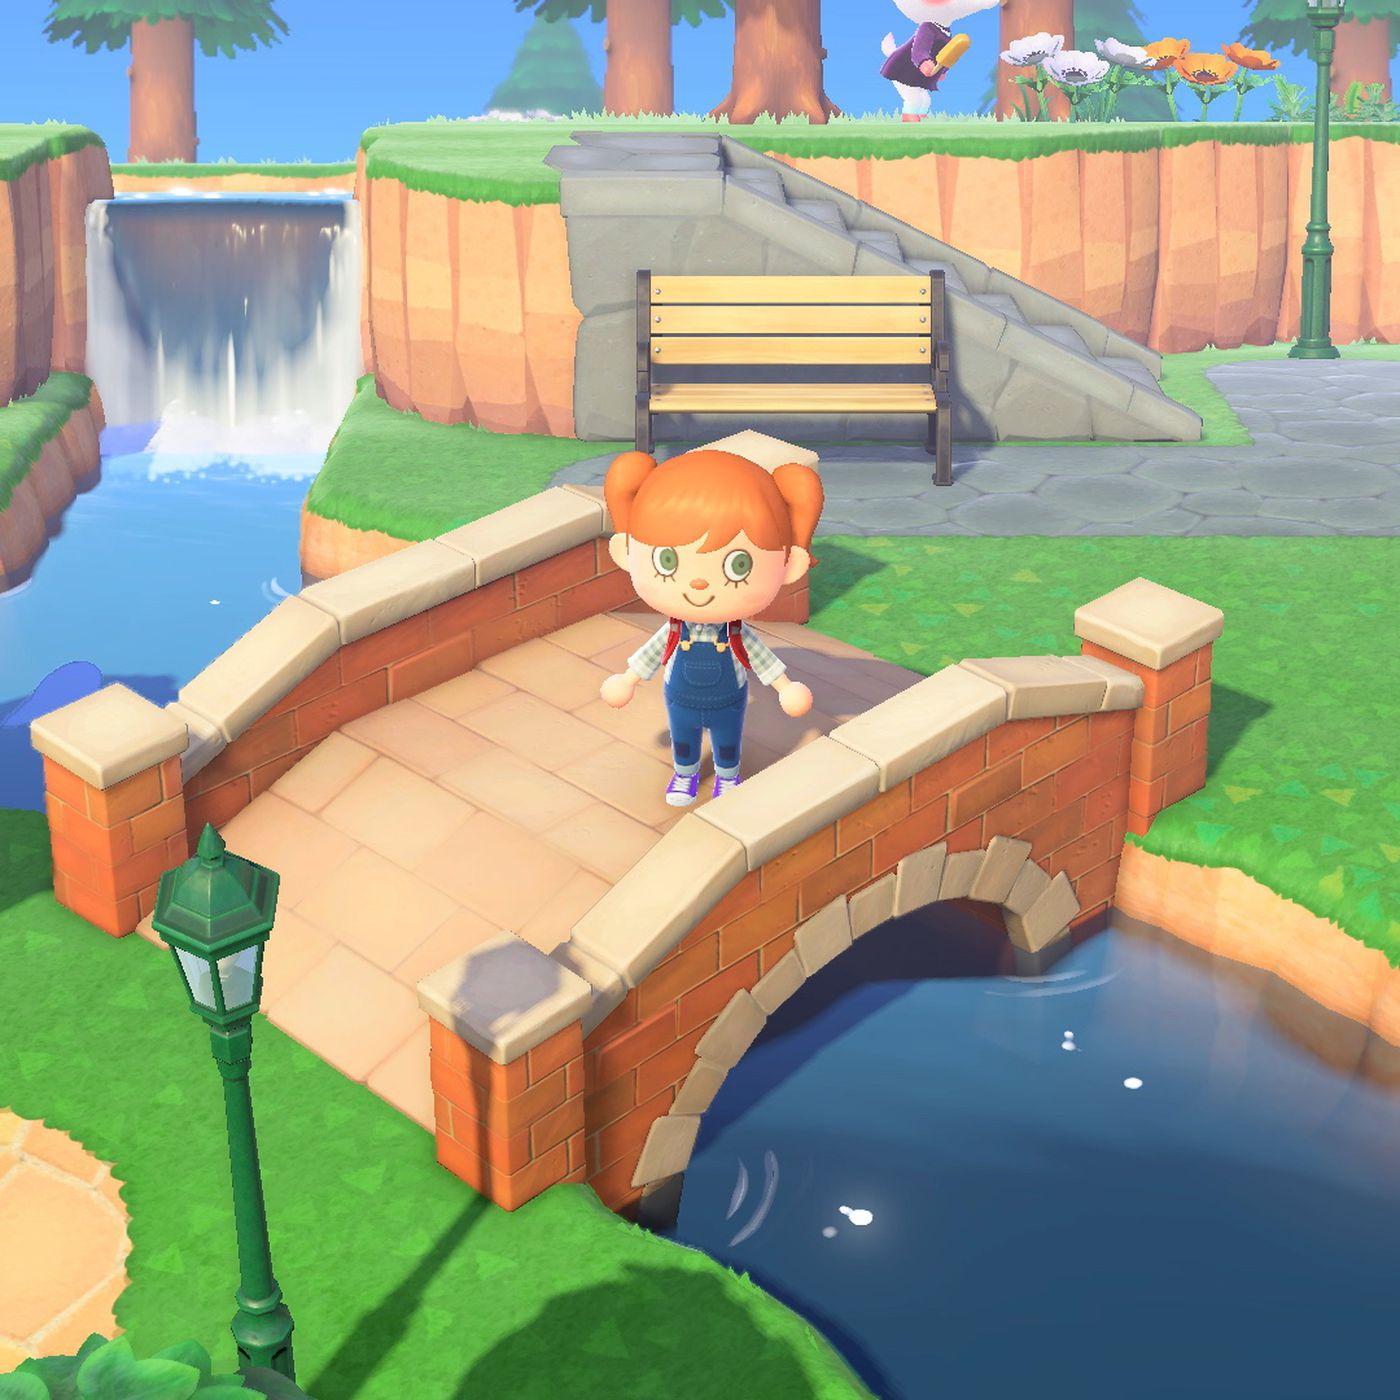 Animal Crossing New Horizon S Mysterious Gravestone Has Players